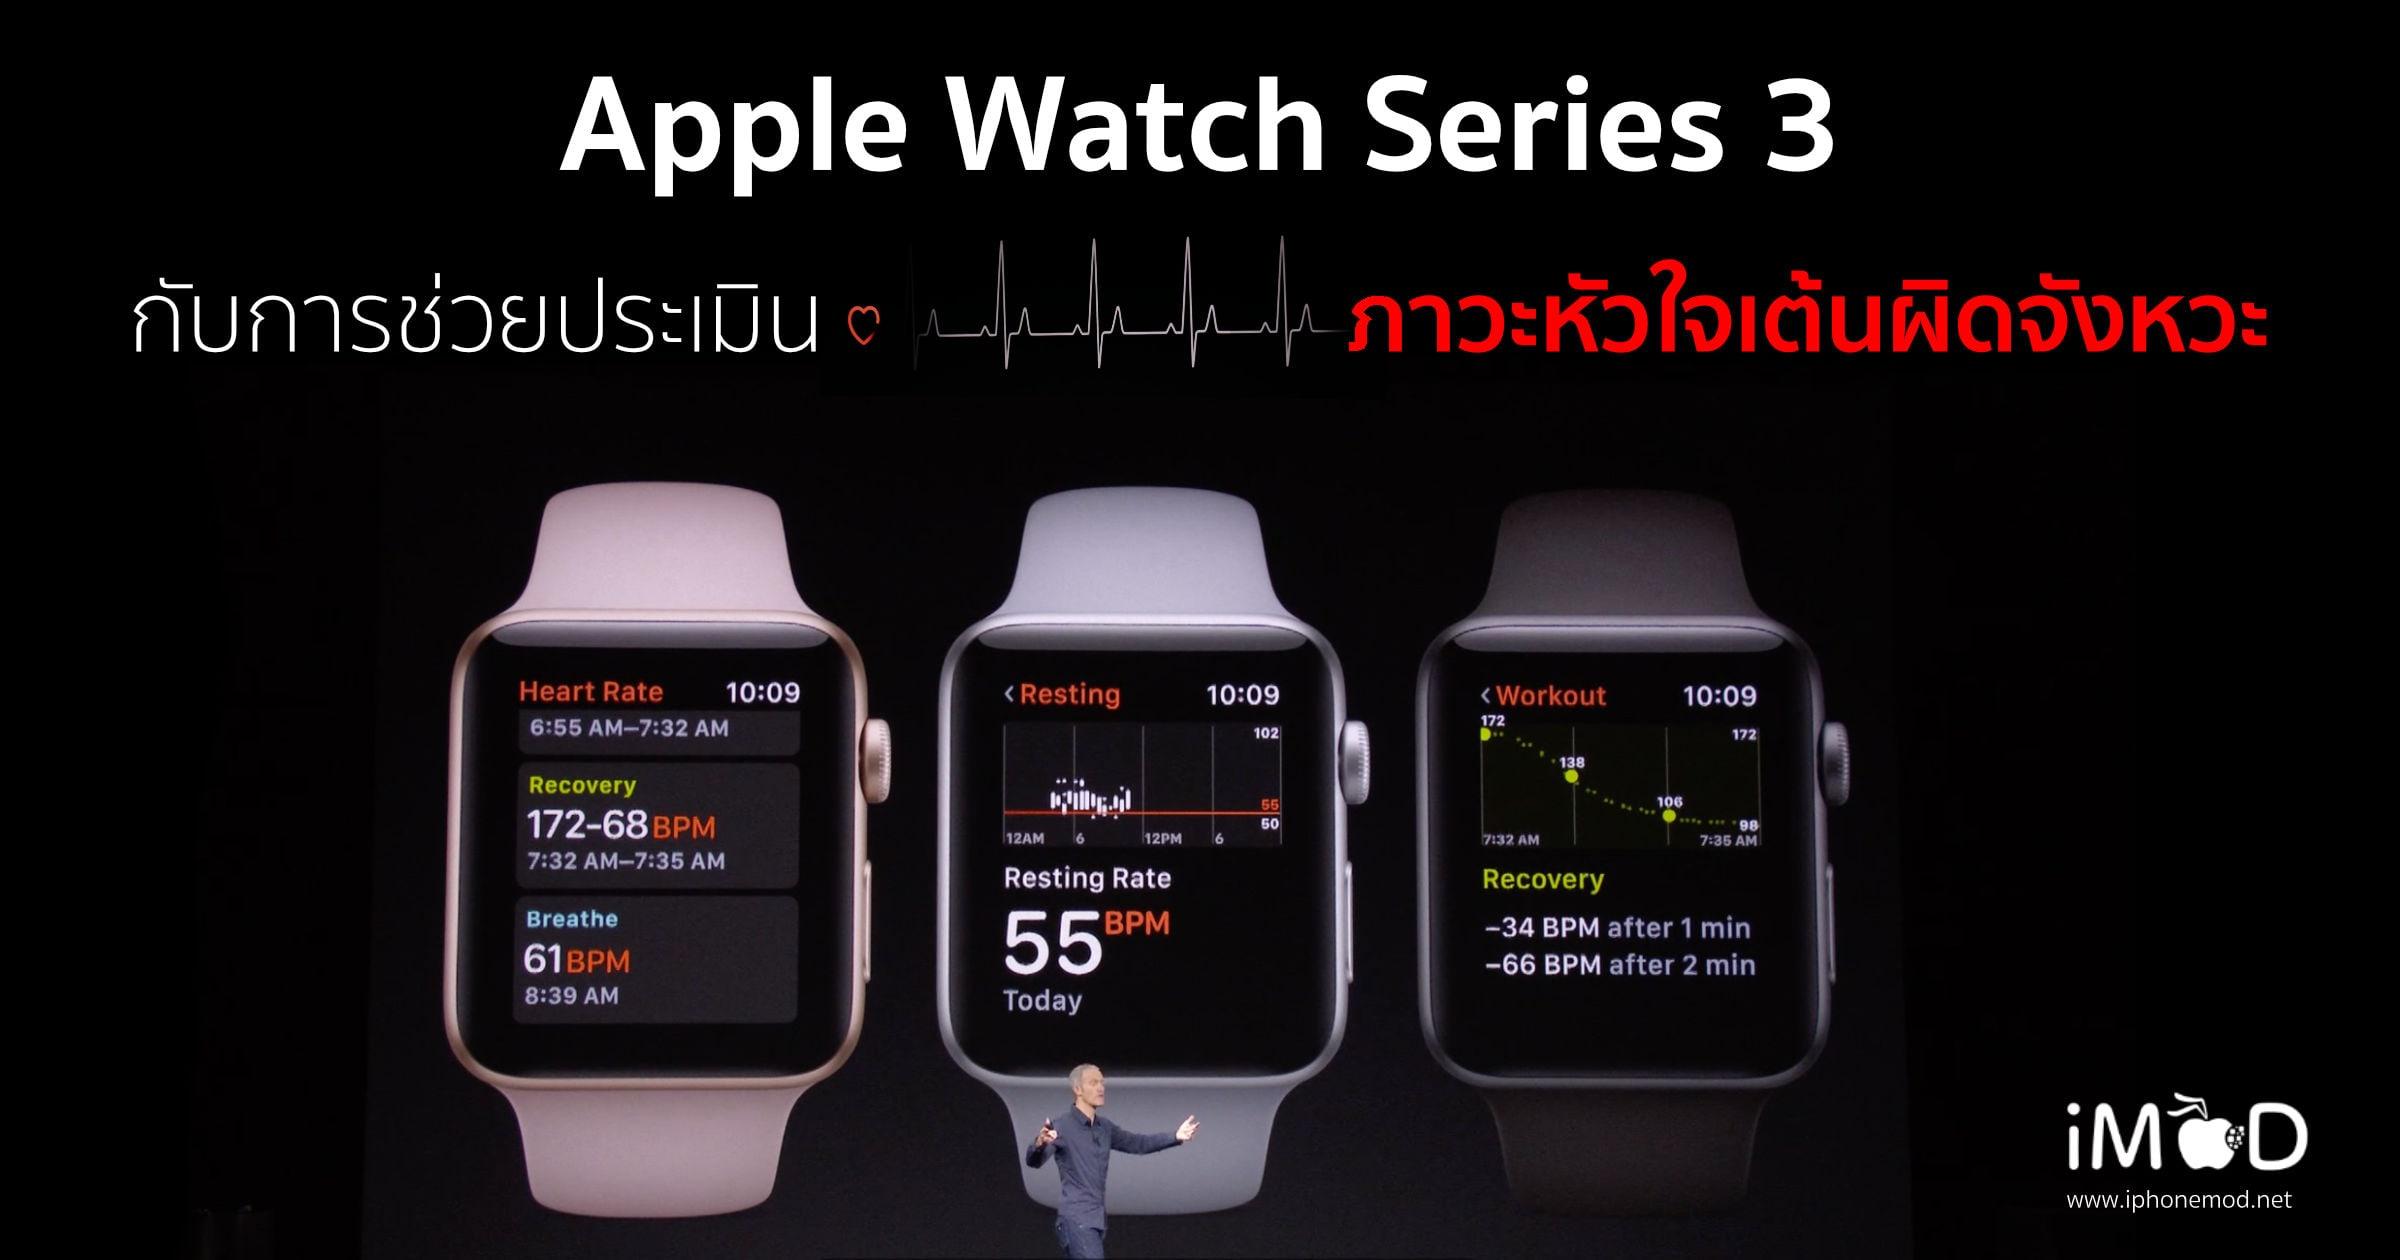 Apple Watch Series 3 Apple Heart Study